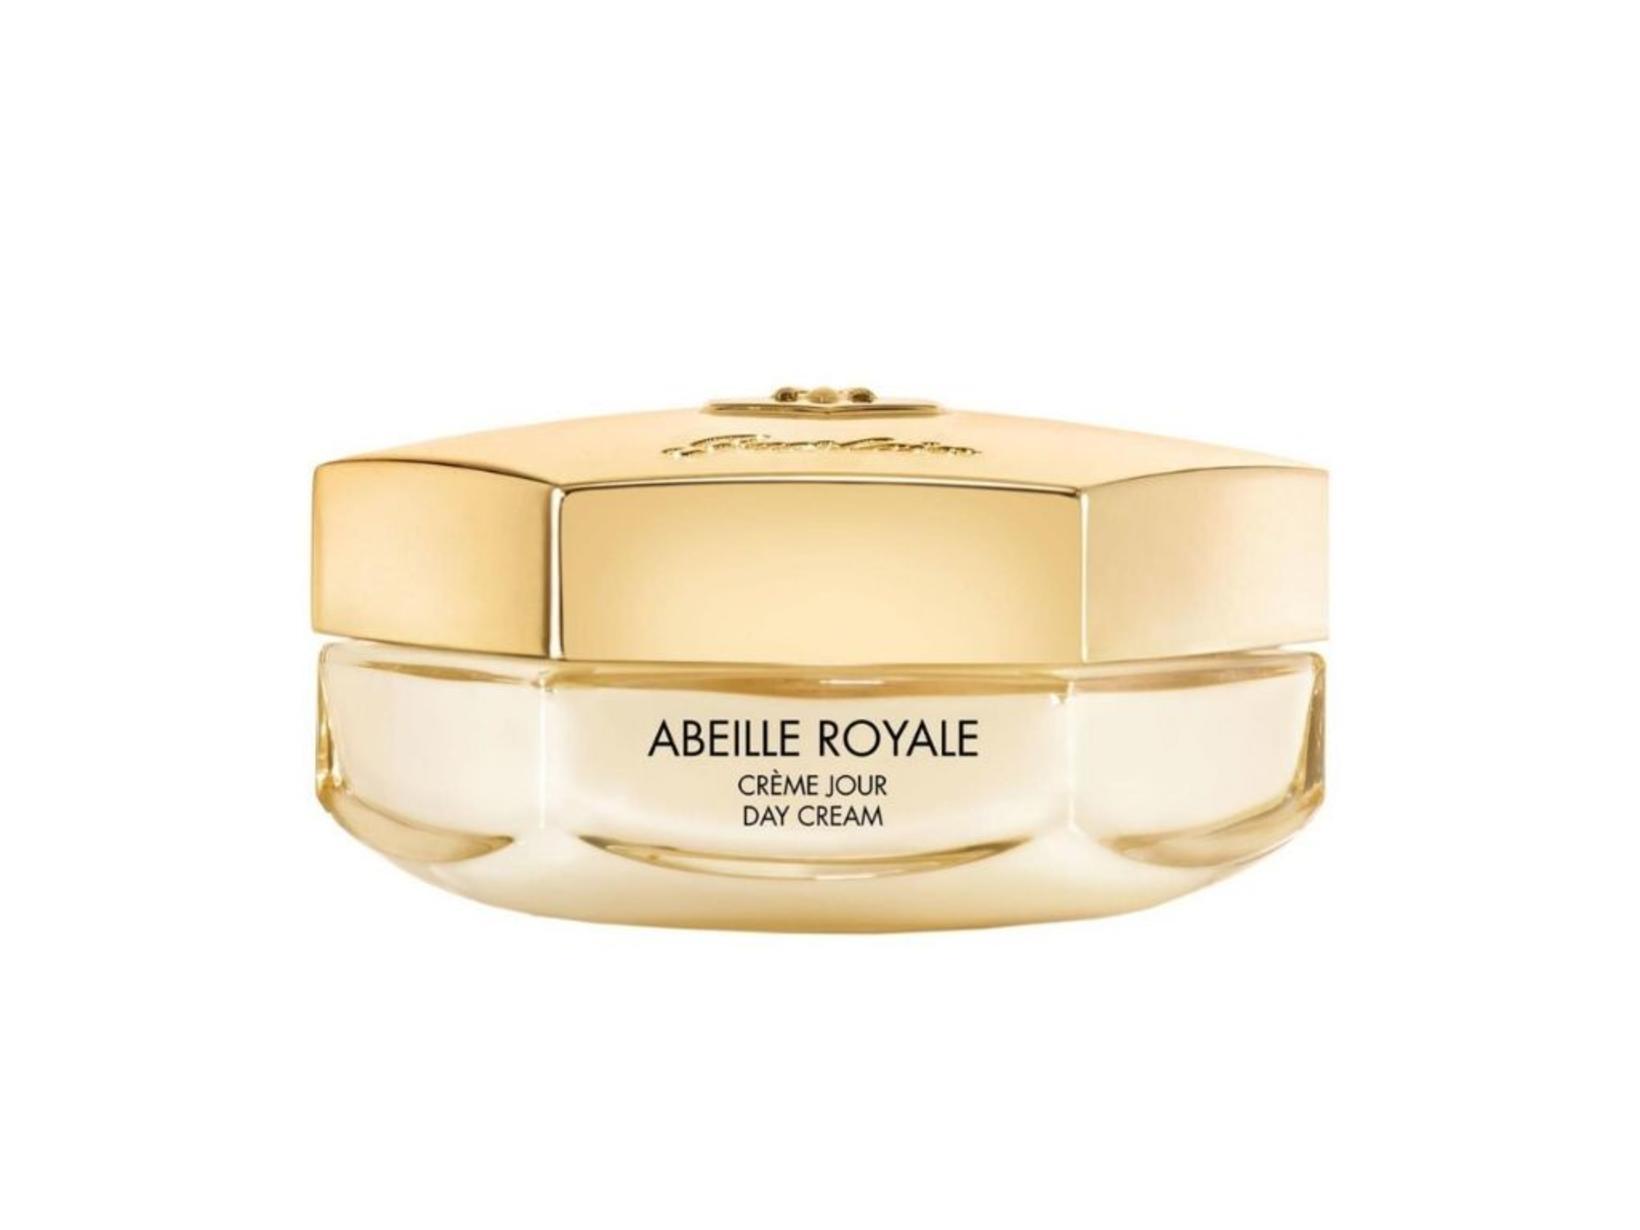 Guerlain Abeille Royale Day Cream.